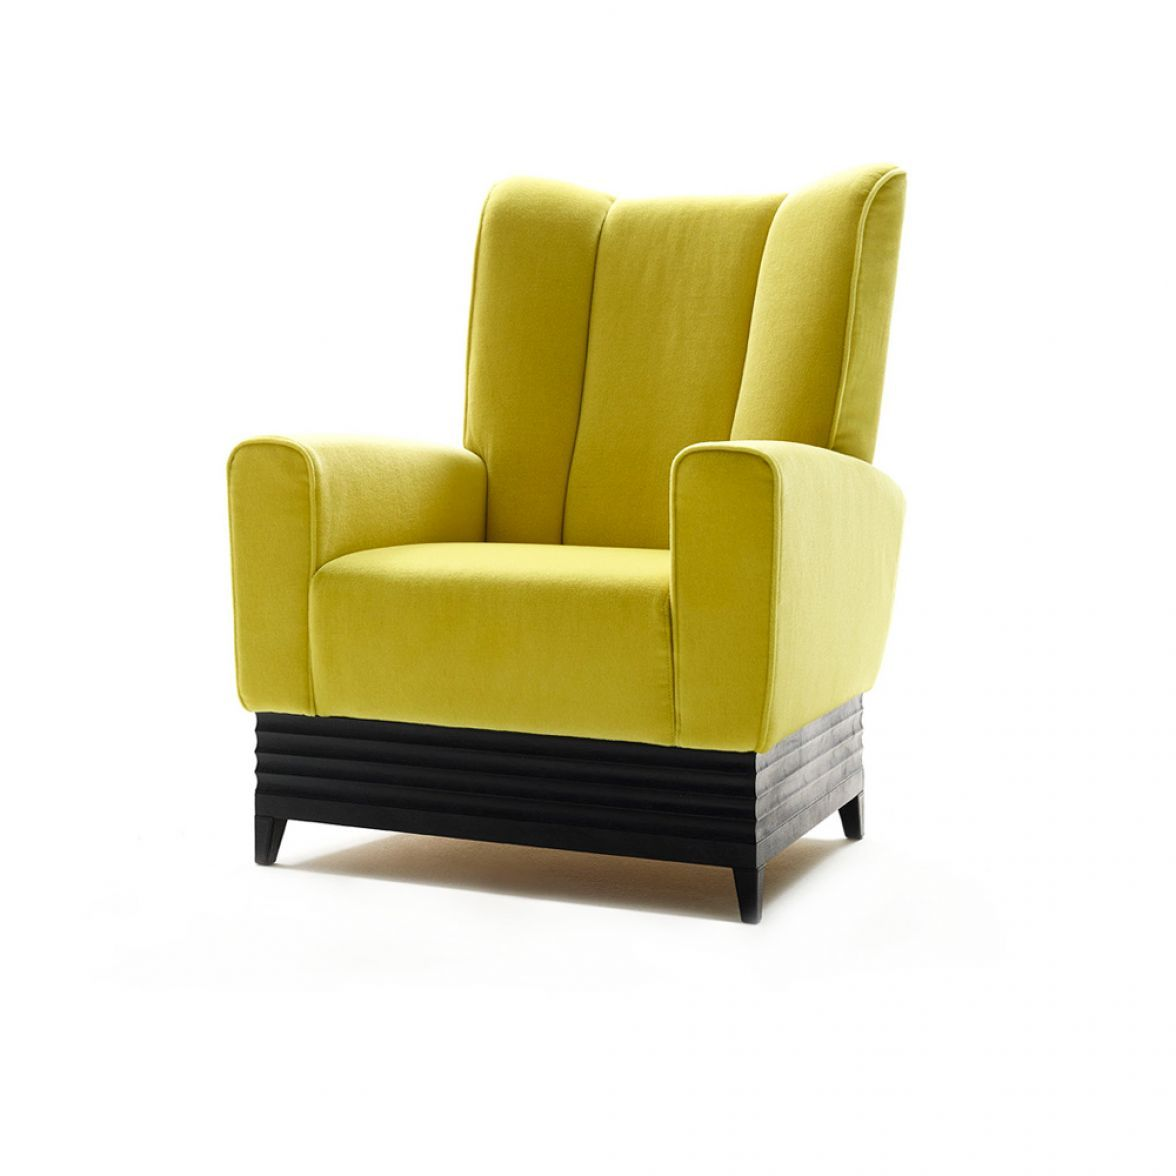 Laurence armchair